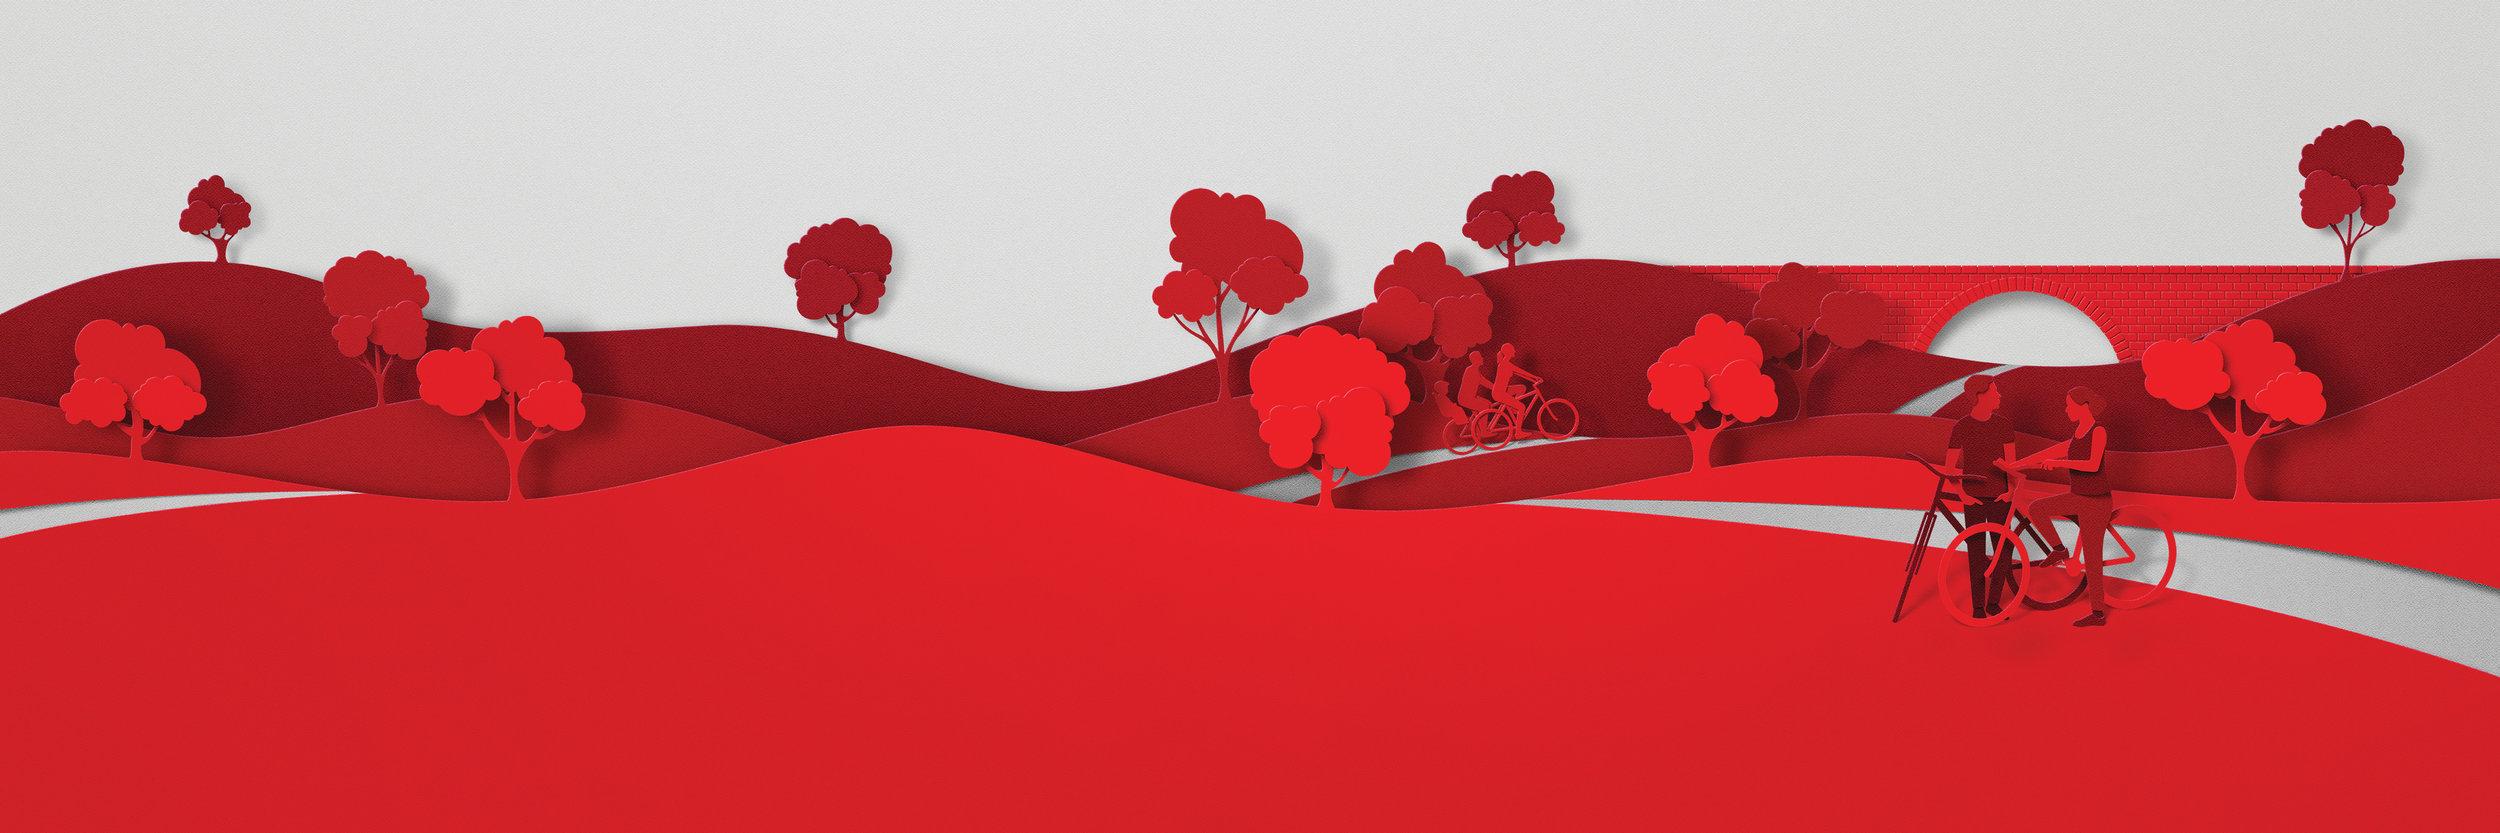 NYPMG Landscapes3.jpg